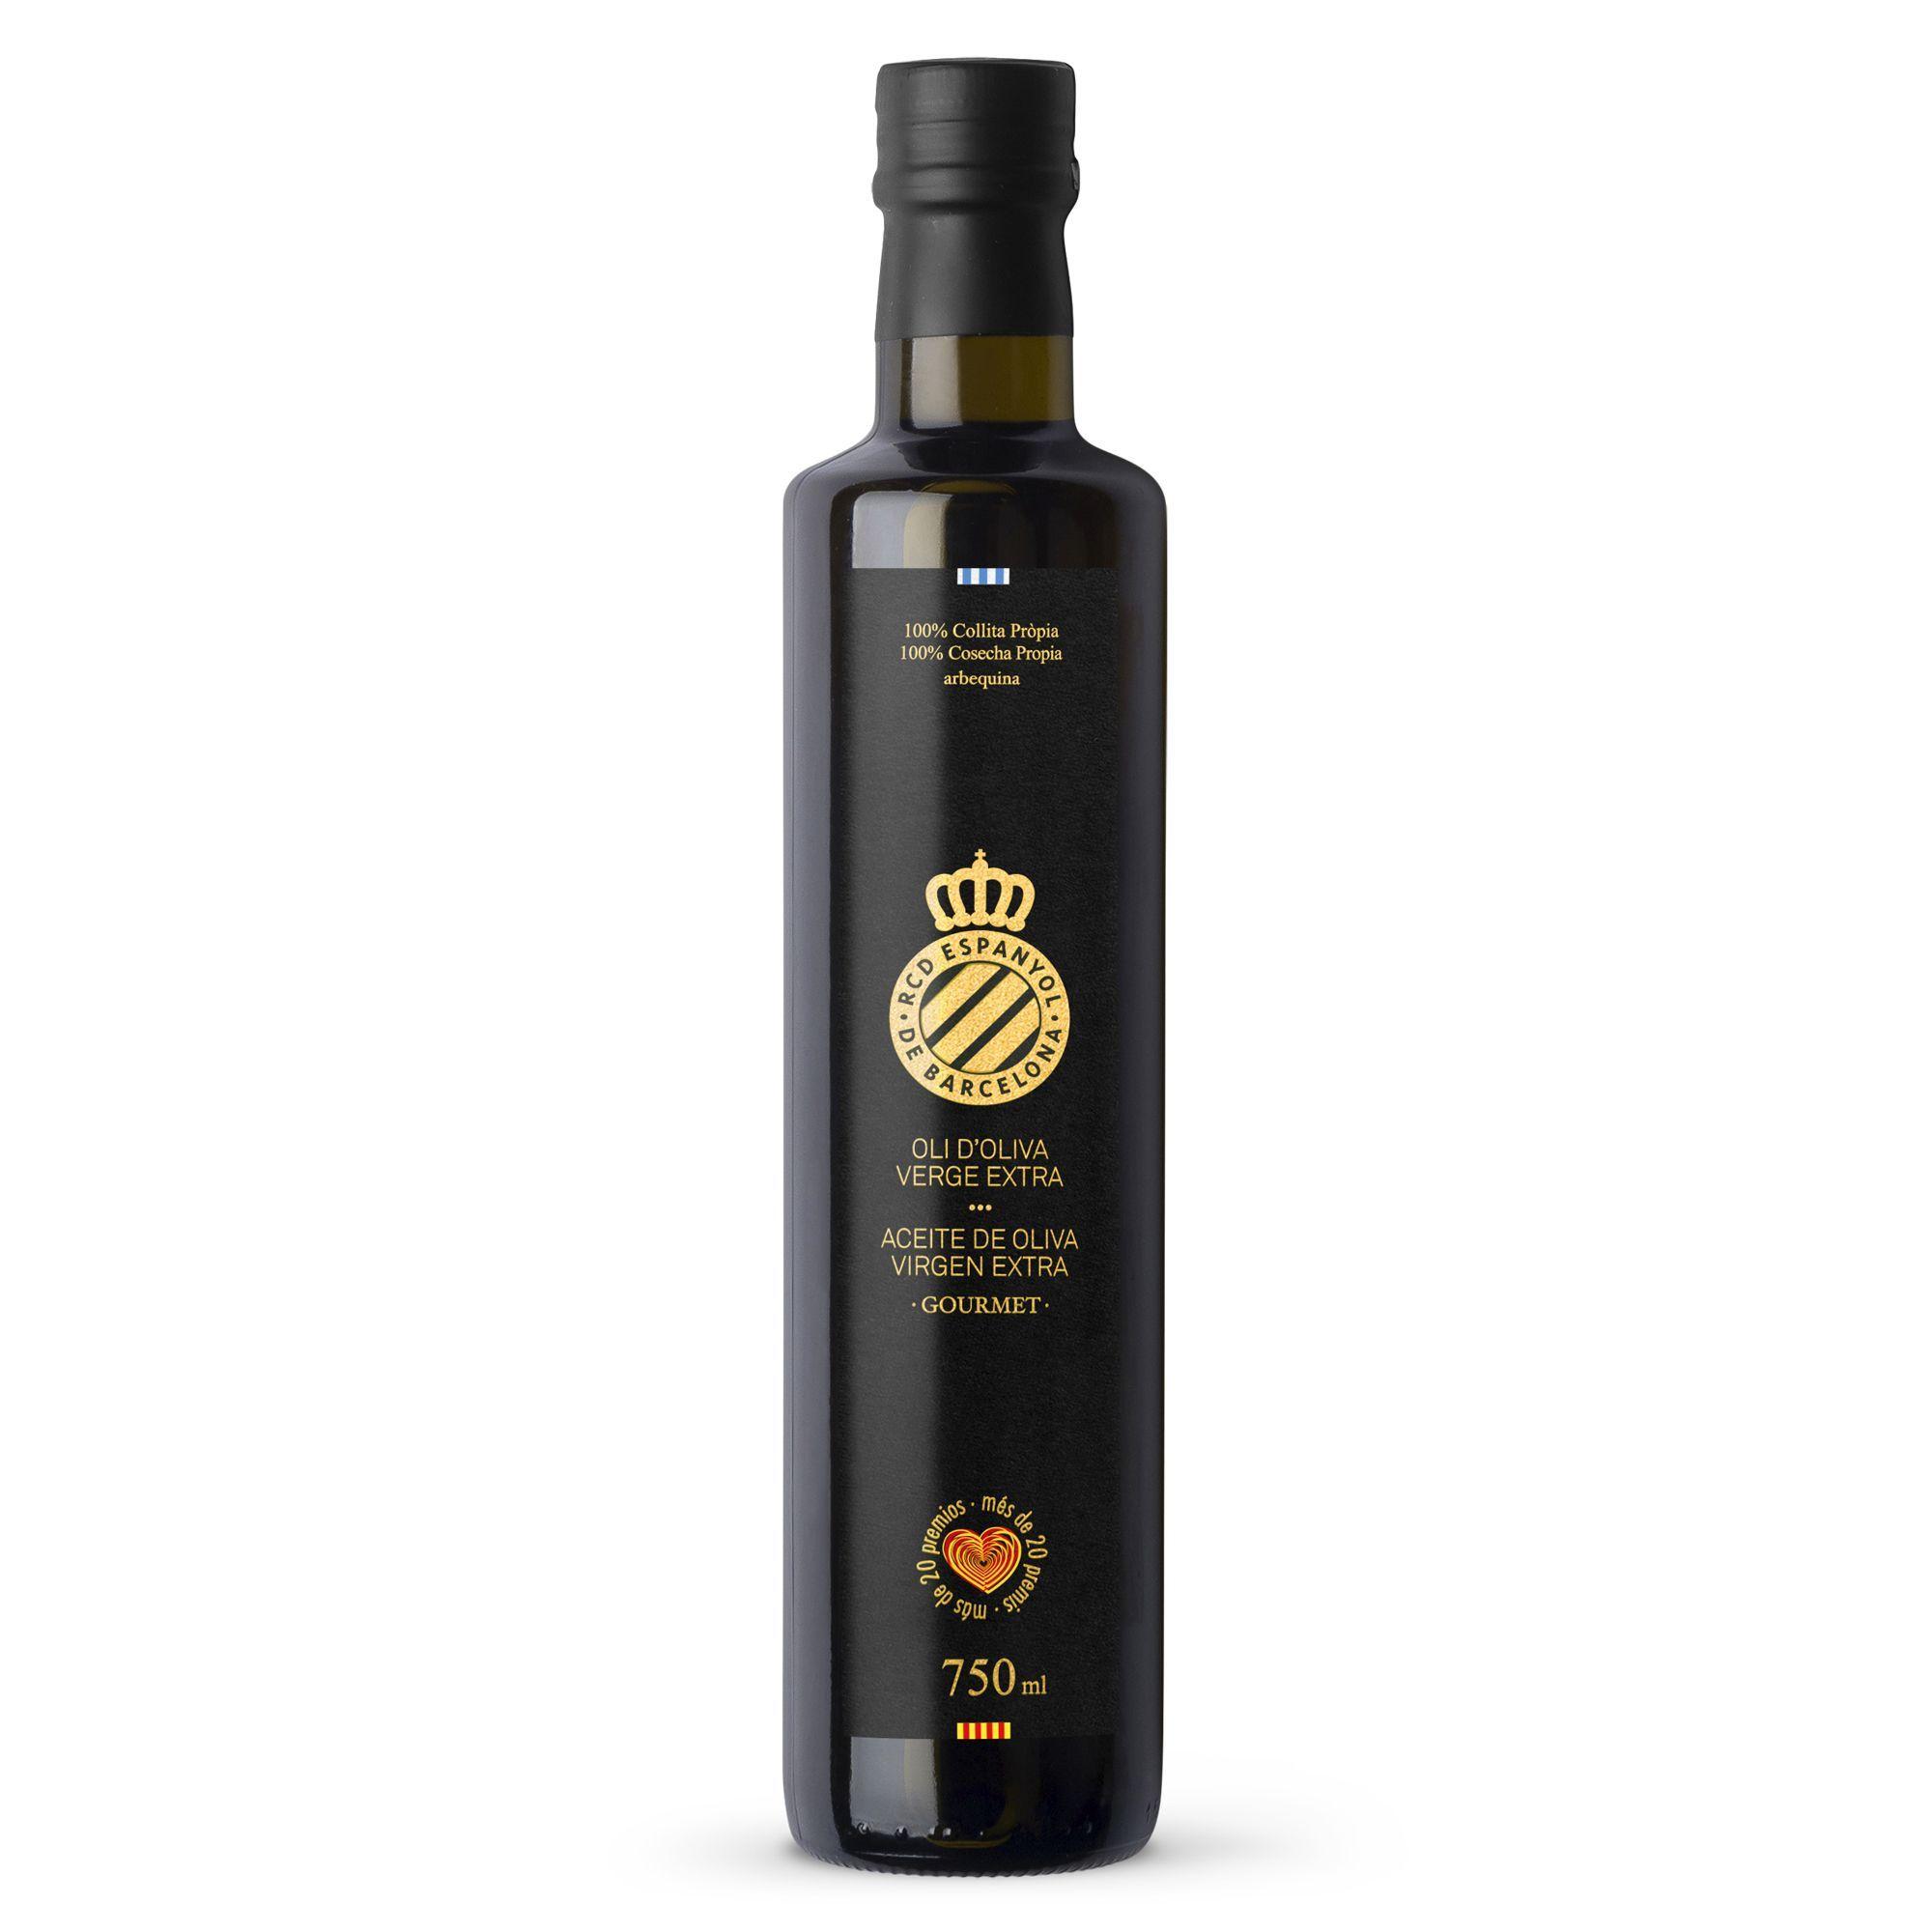 Comprar 750 ml Aceite De Oliva Virgen Extra 100% Arbequina - Botella De Cristal RCD Espanyol (Ed. Limitada) | Escornalbou Gourmet